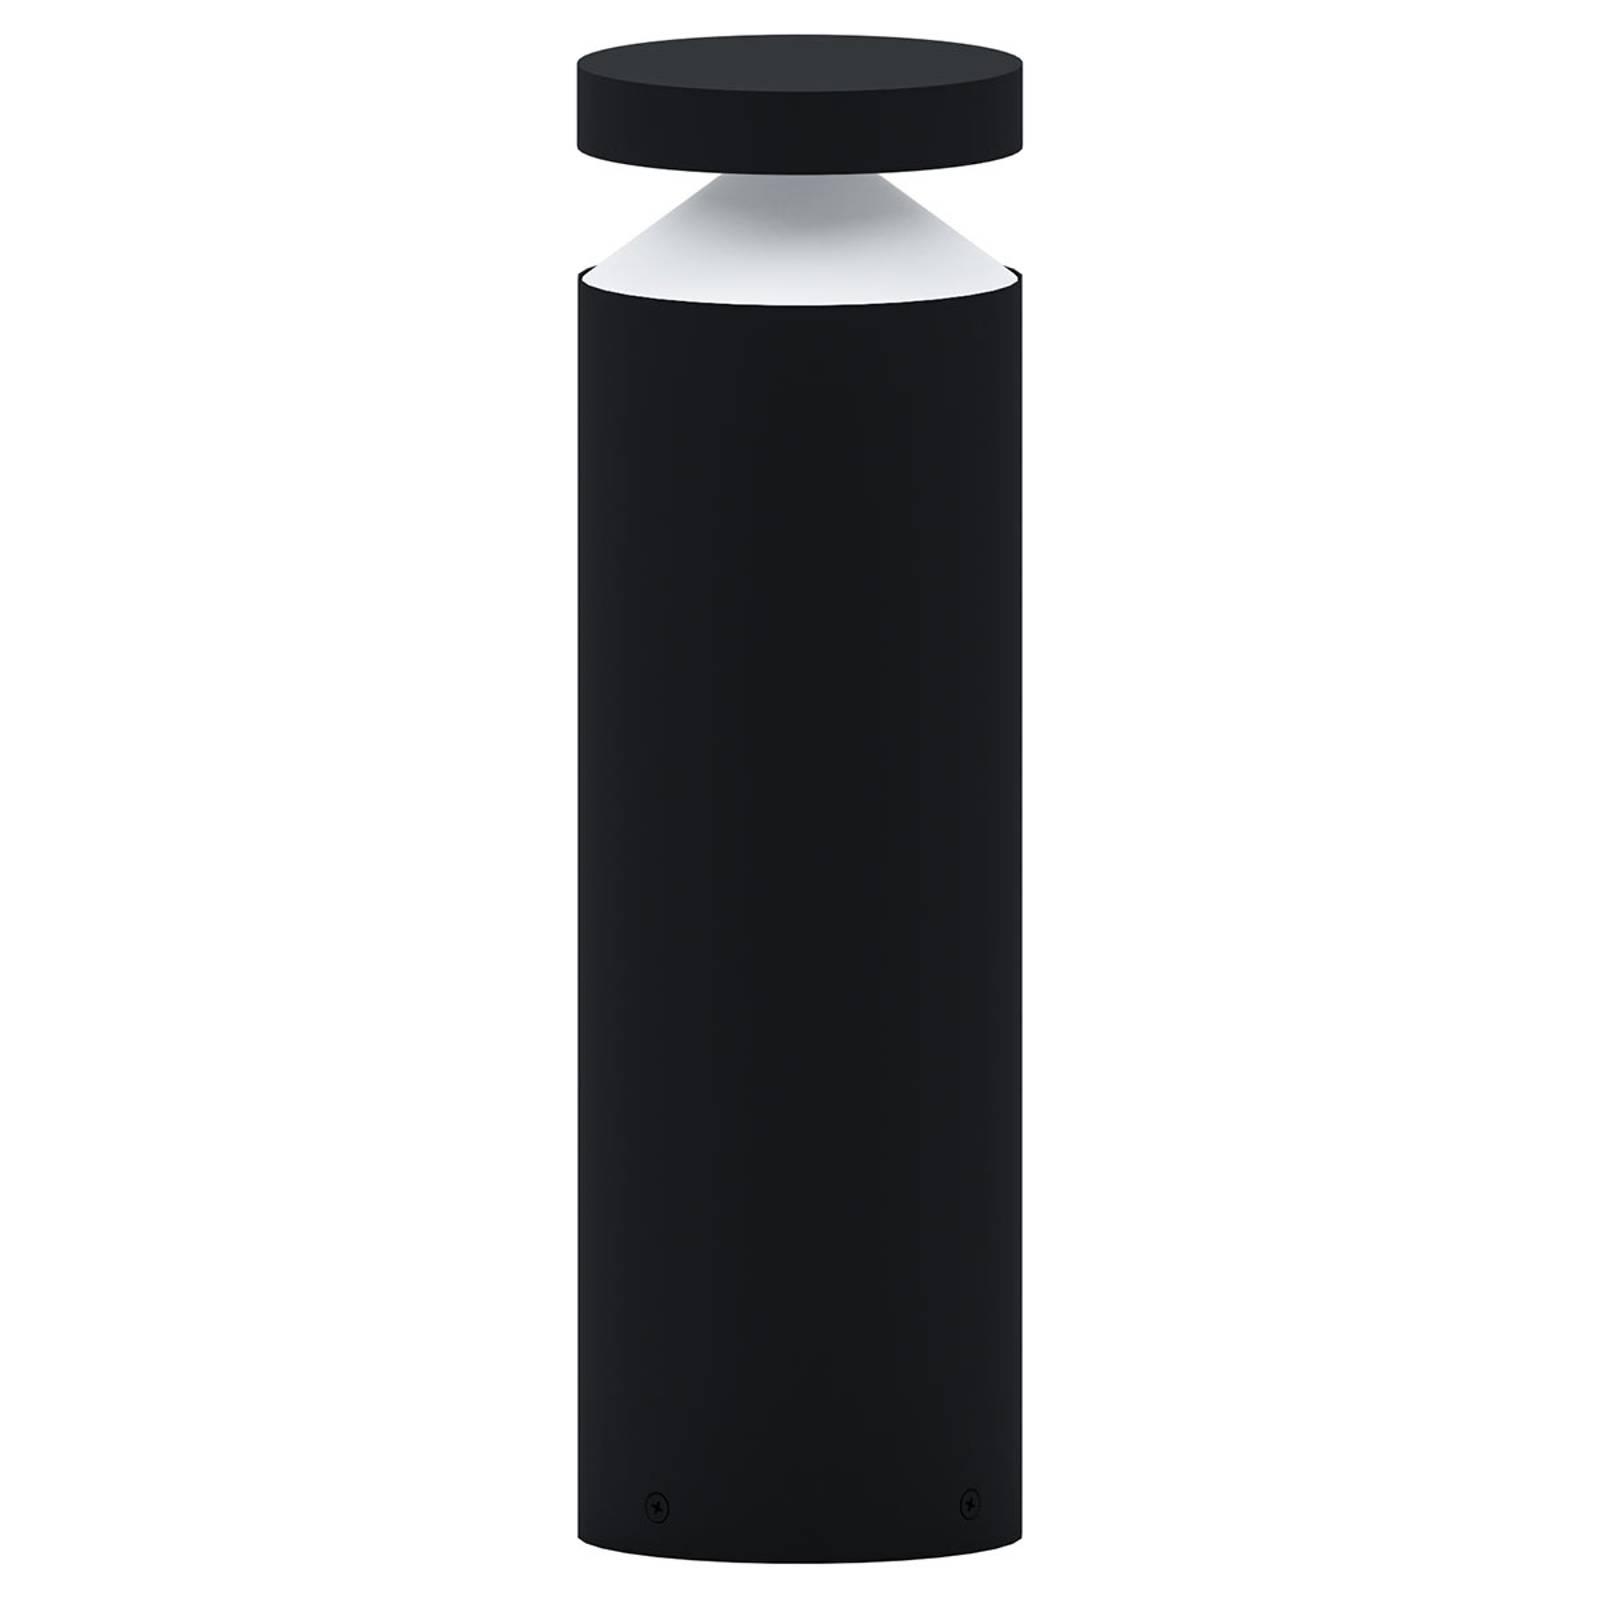 LED-Sockelleuchte Melzo, schwarz